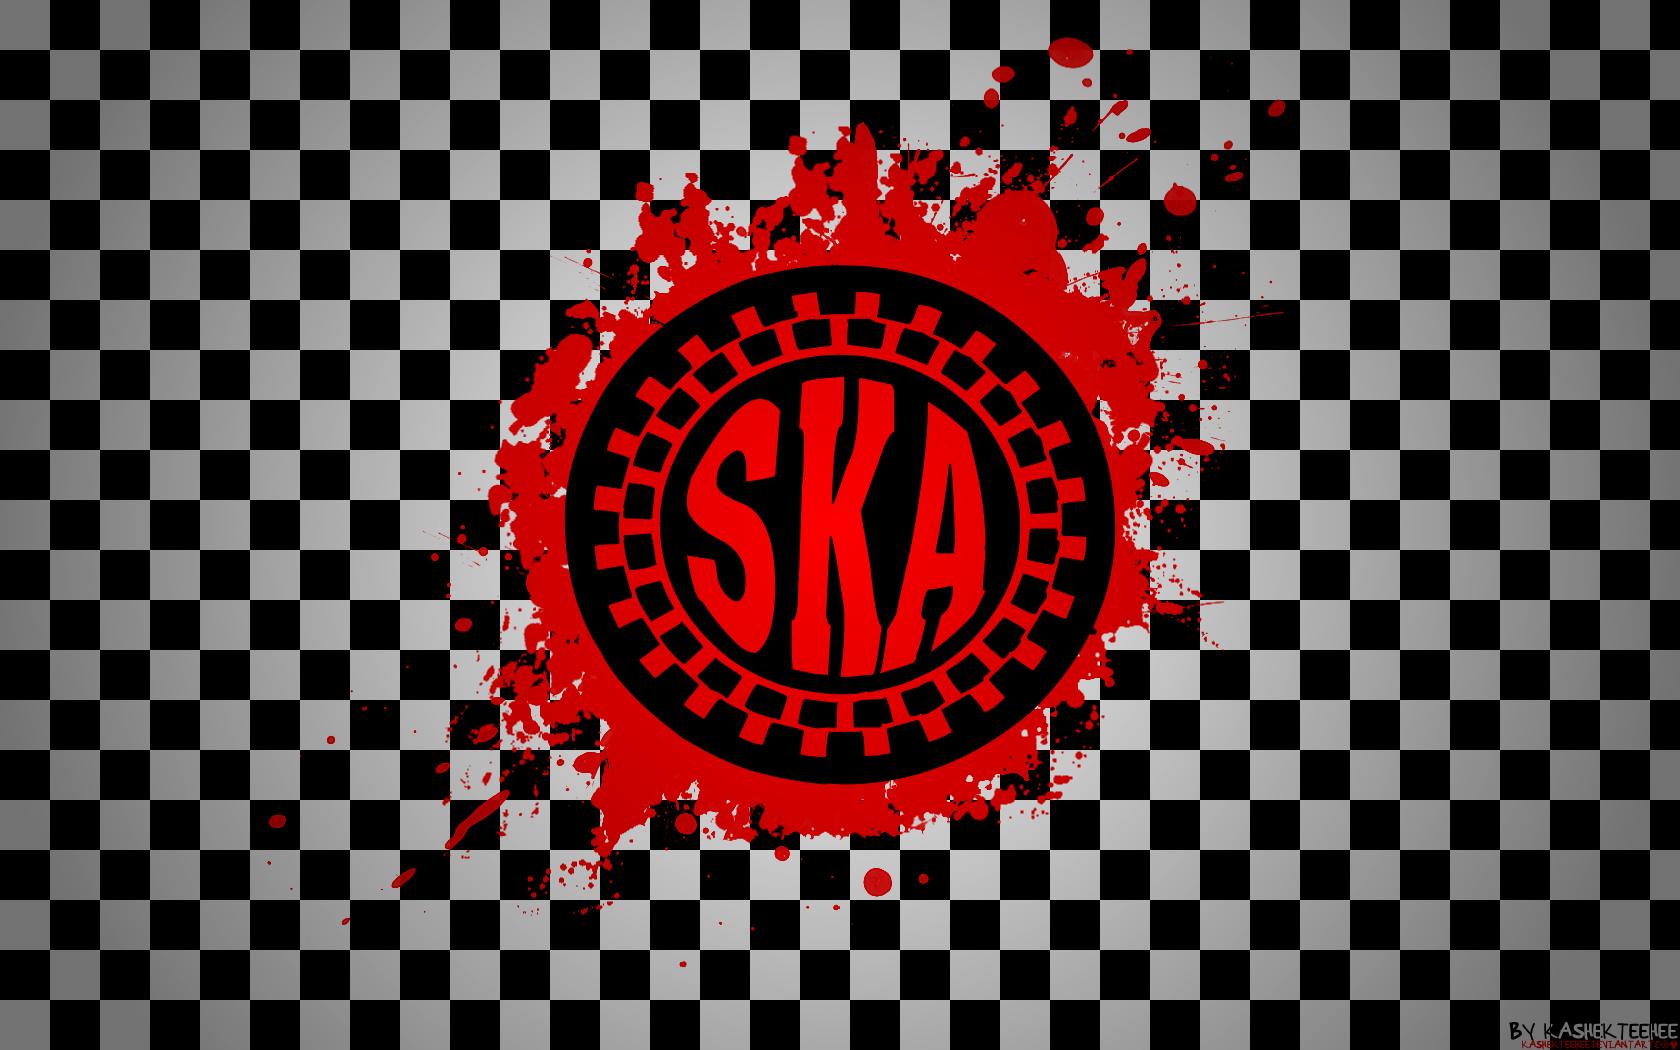 SKA-llpaper by kashekTEEHEE on DeviantArt